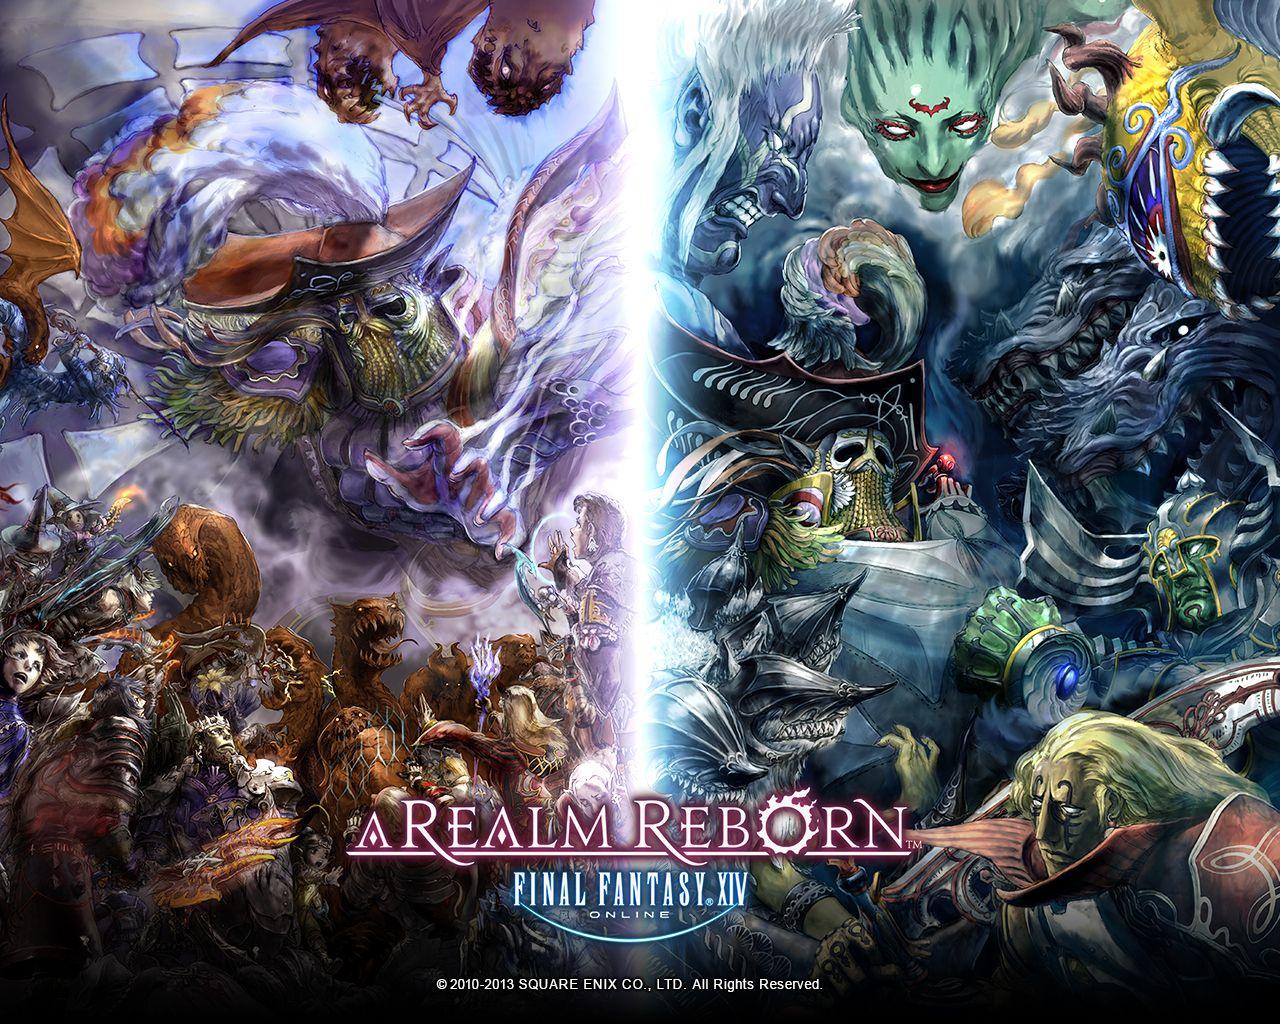 Final Fantasy Xiv A Realm Reborn Fantasy Art Wallpapers: Final Fantasy XIV A Realm Reborn Wallpaper Game Wallpapers